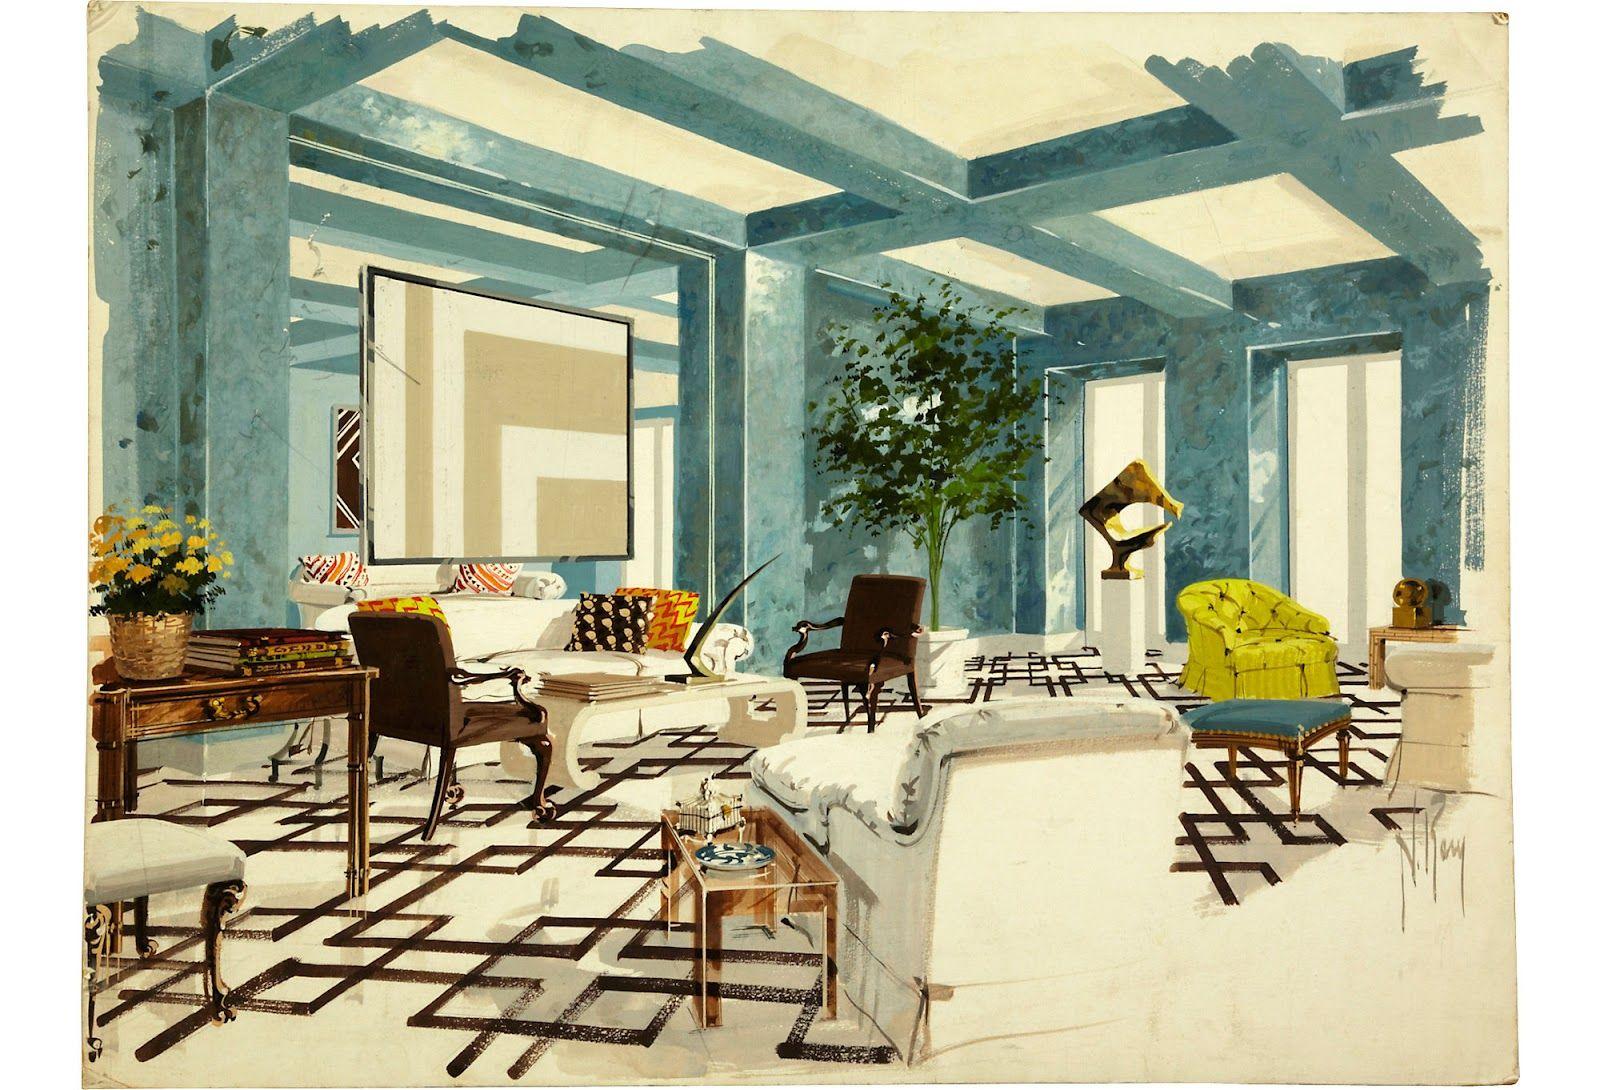 blue room presentation drawing albert hadley design in